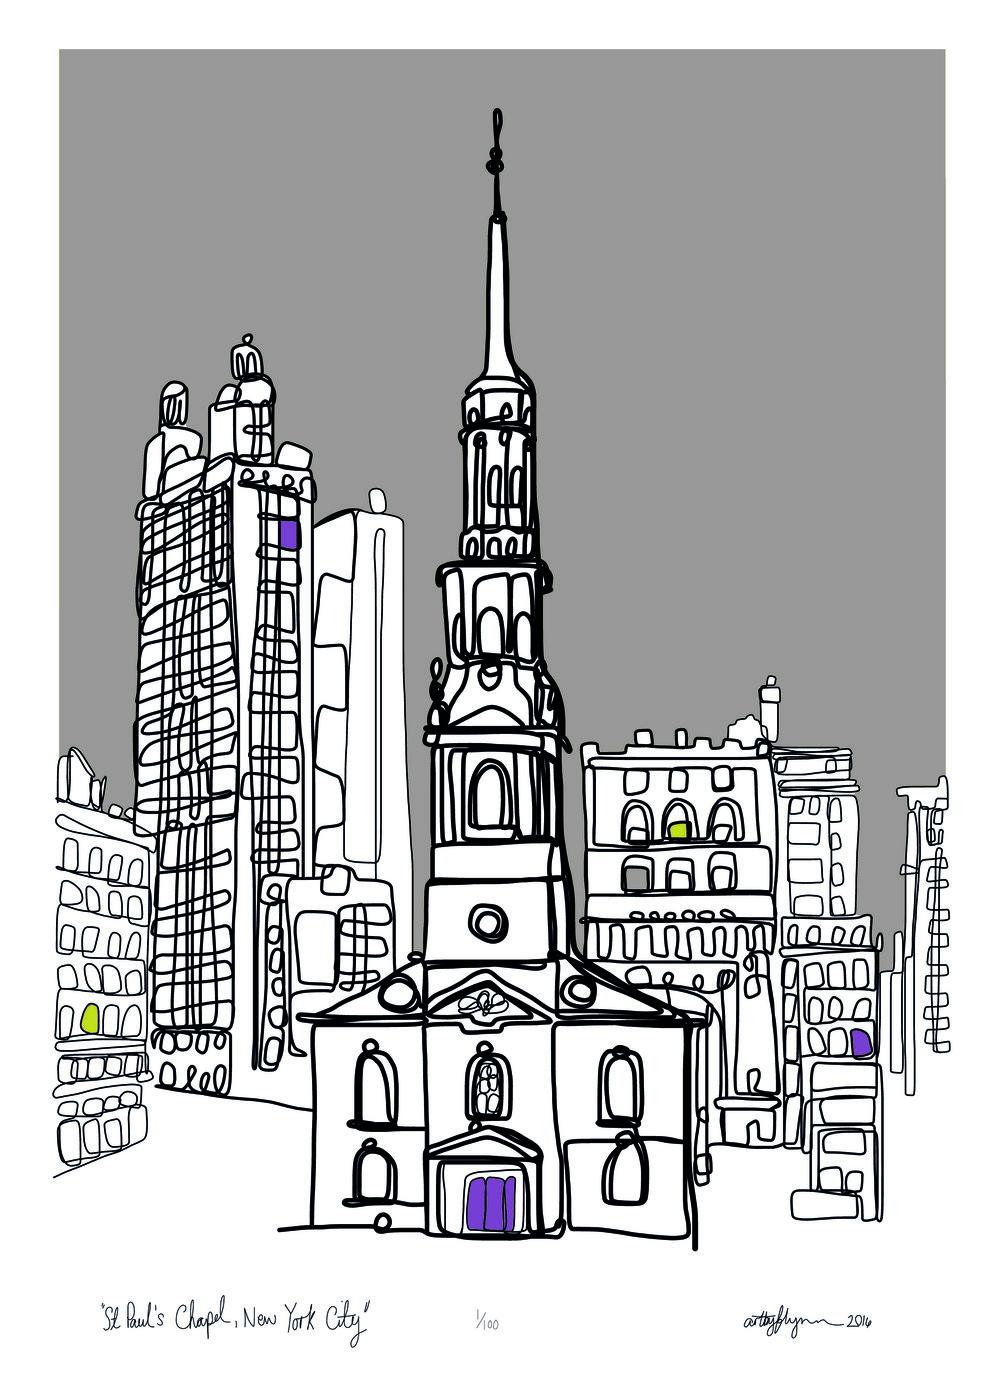 St Paul's chapel, New York City